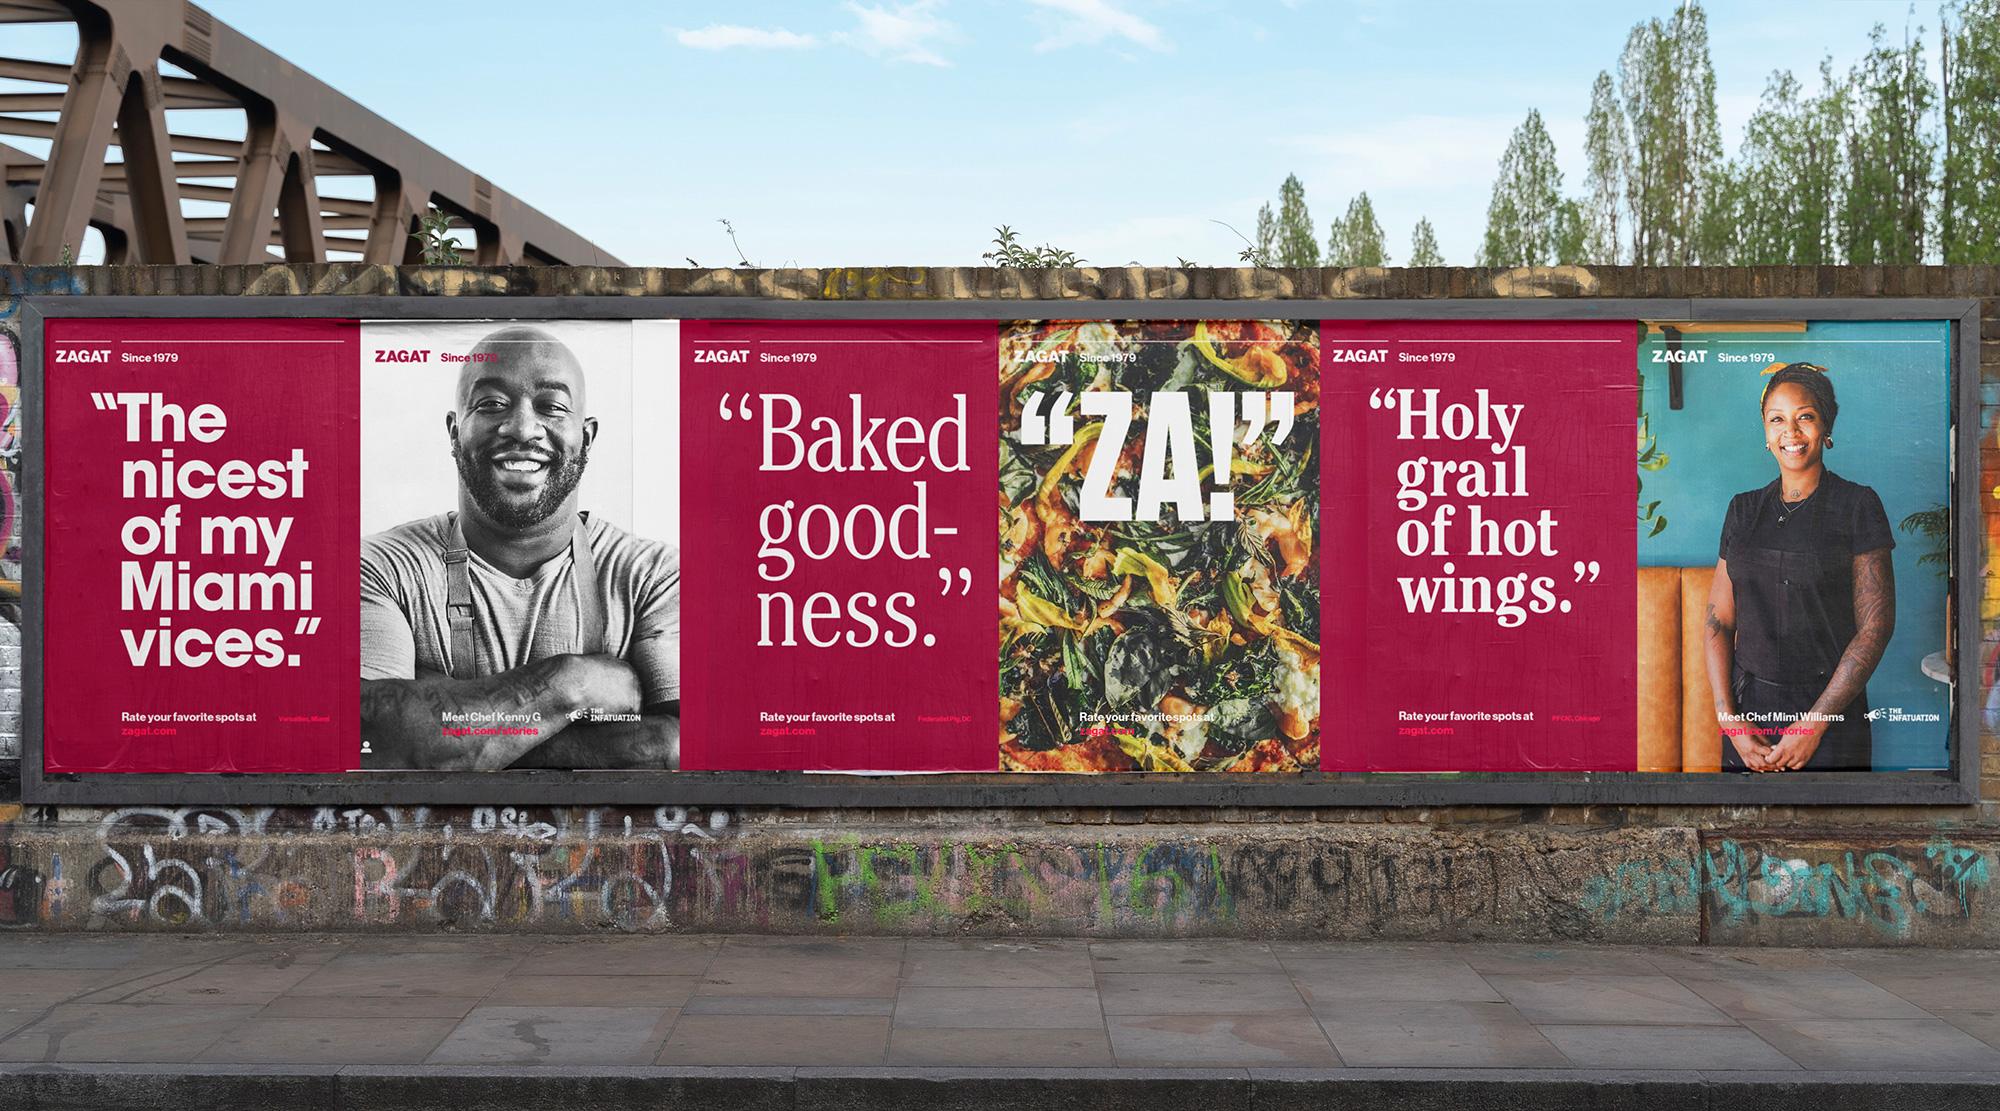 Zagat Restaurant Rebrand Created by Franklyn